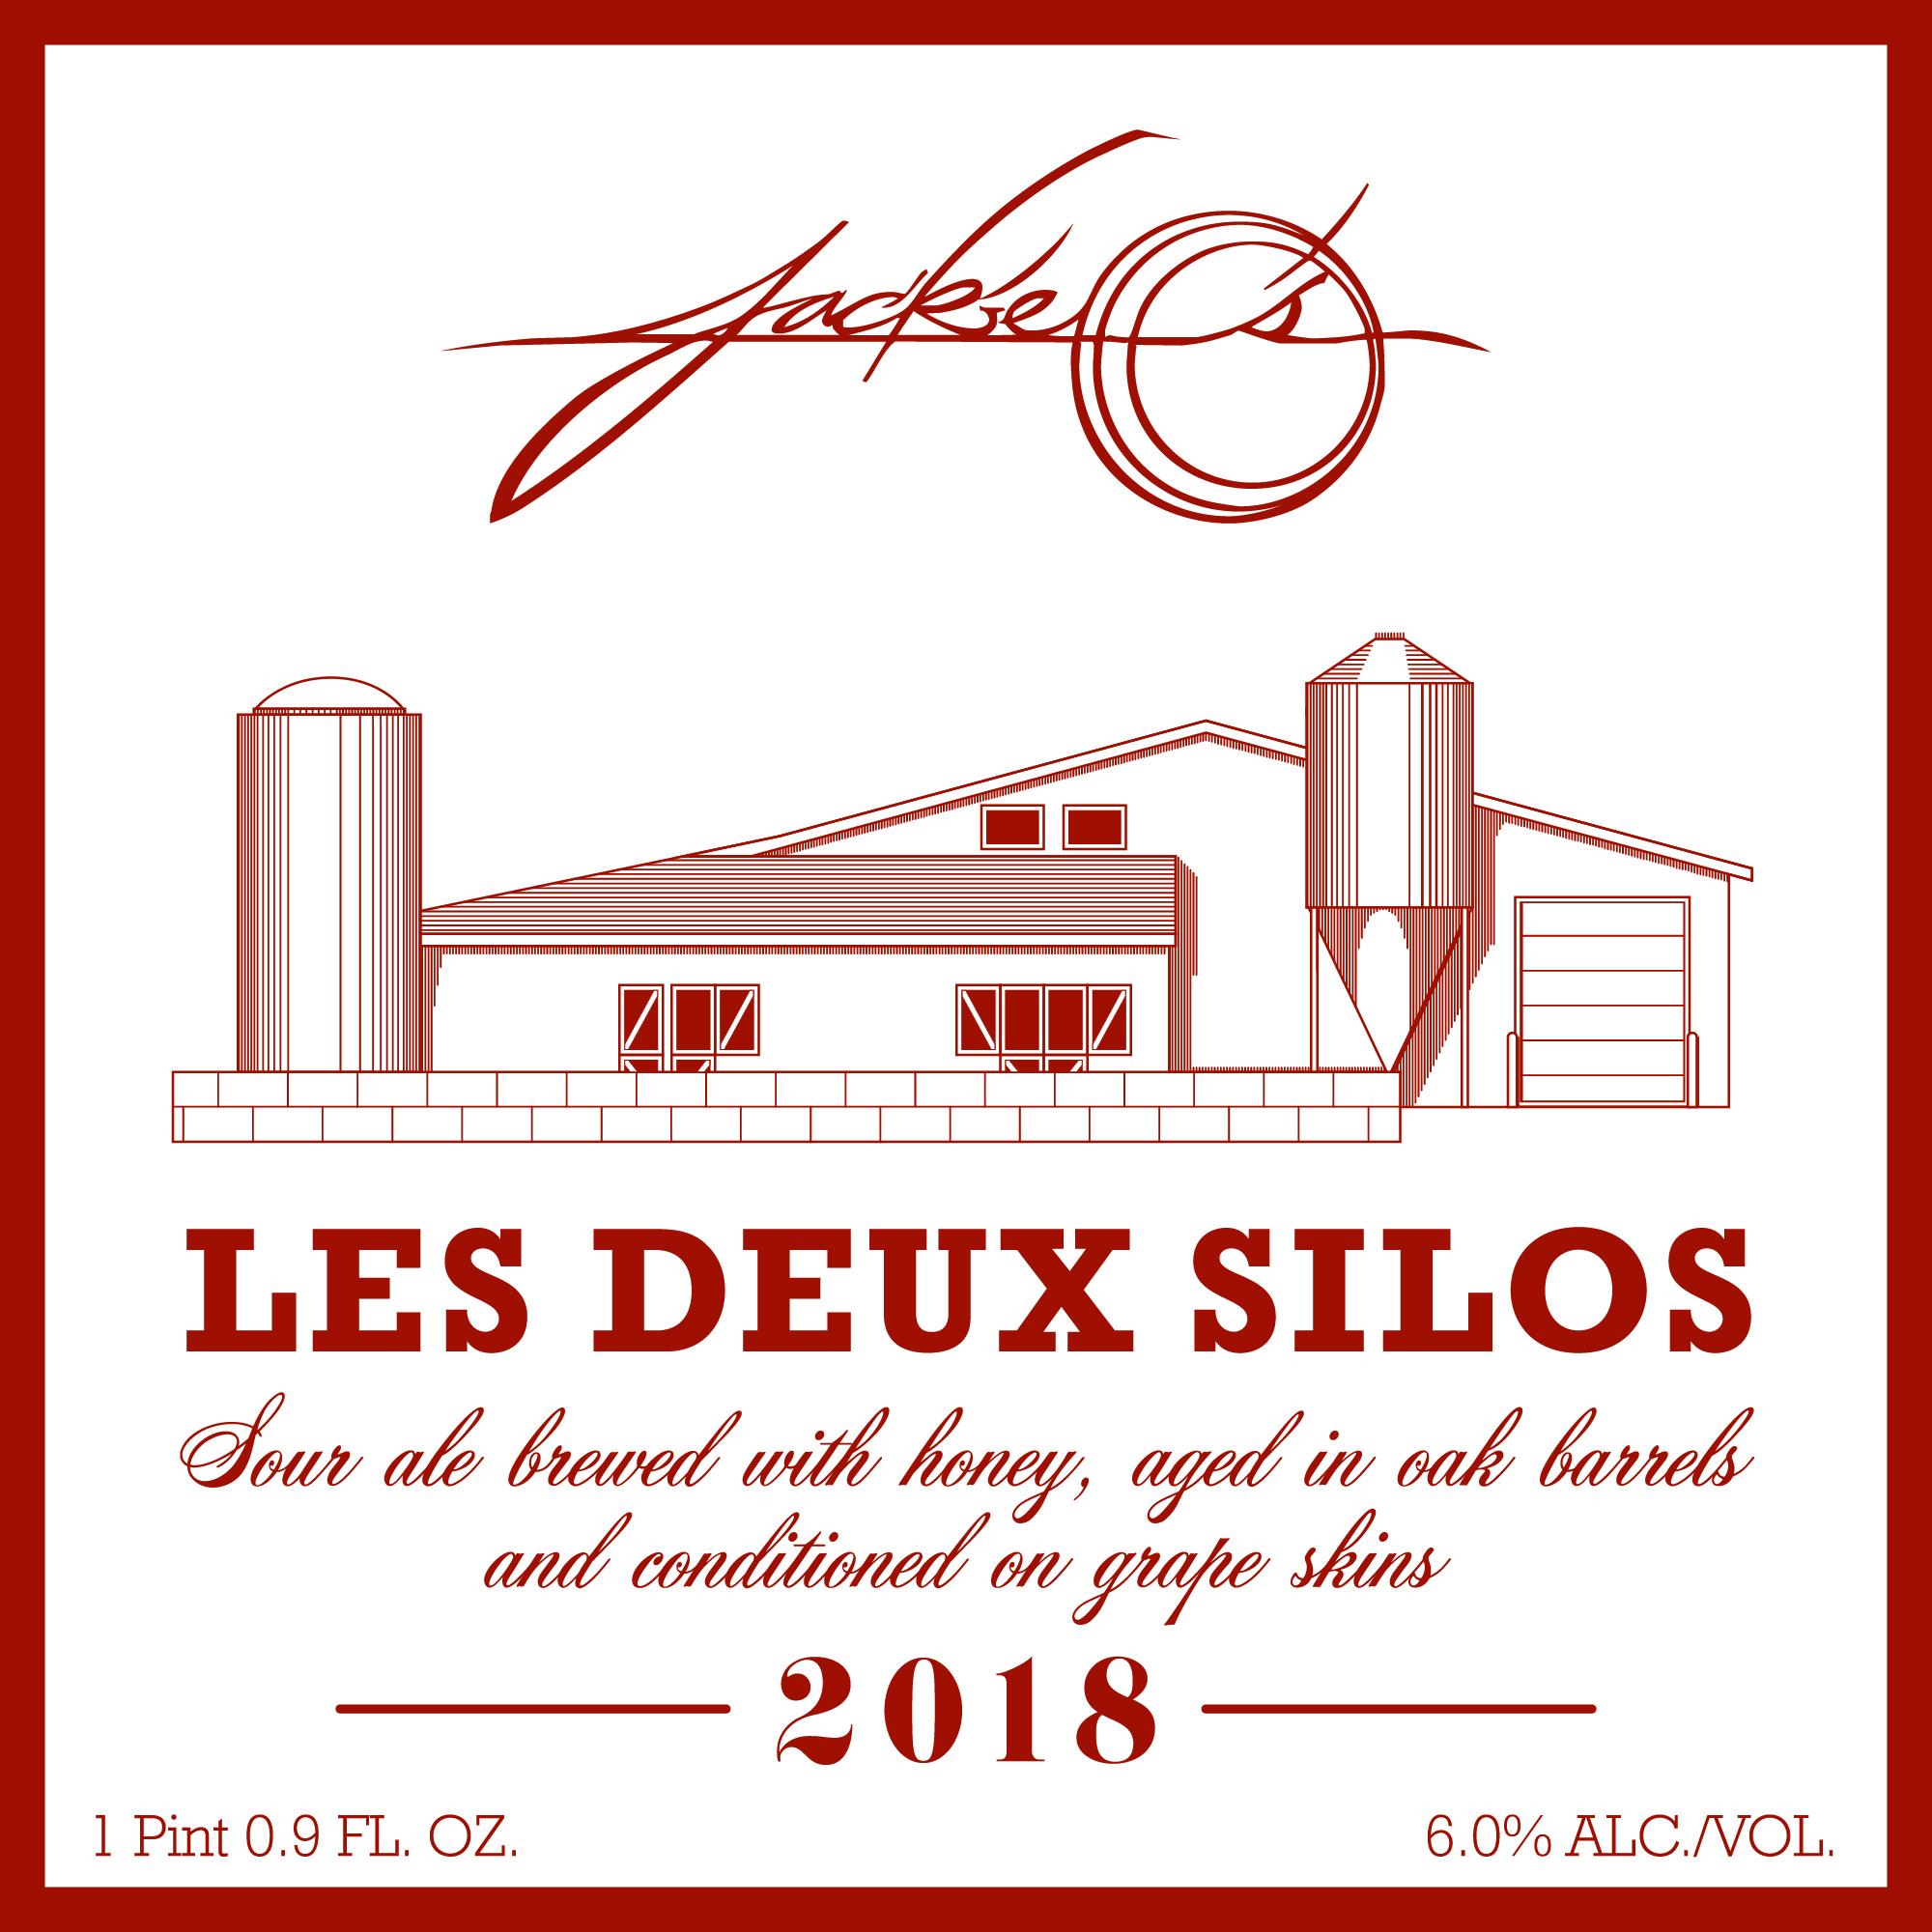 Jackie O's Les Deux Silos Beer